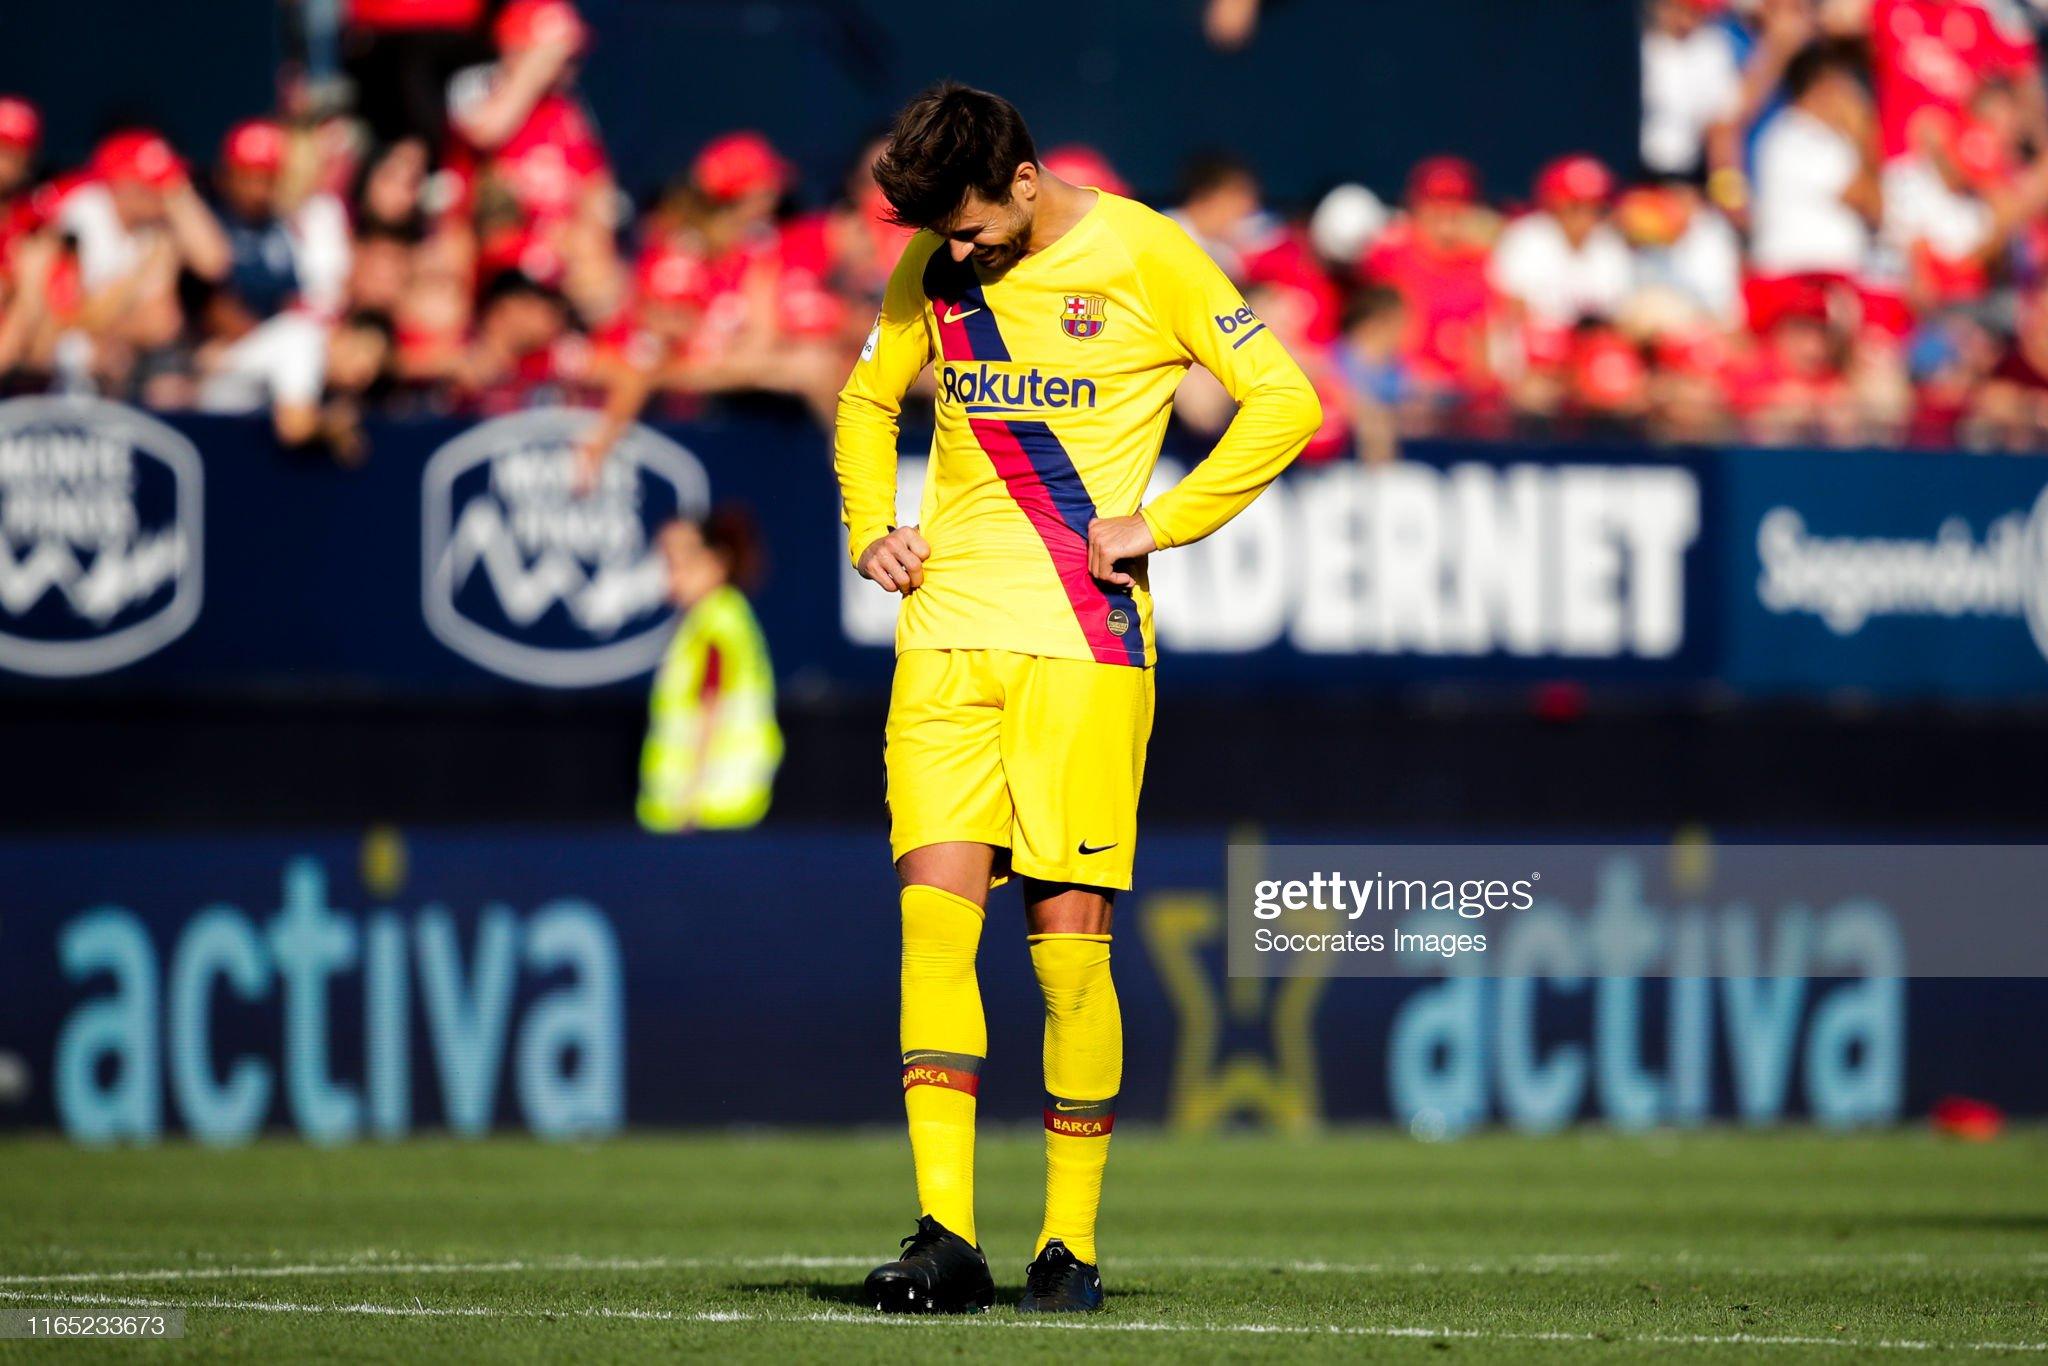 صور مباراة : أوساسونا - برشلونة 2-2 ( 31-08-2019 )  Gerard-pique-of-fc-barcelona-during-the-la-liga-santander-match-v-picture-id1165233673?s=2048x2048